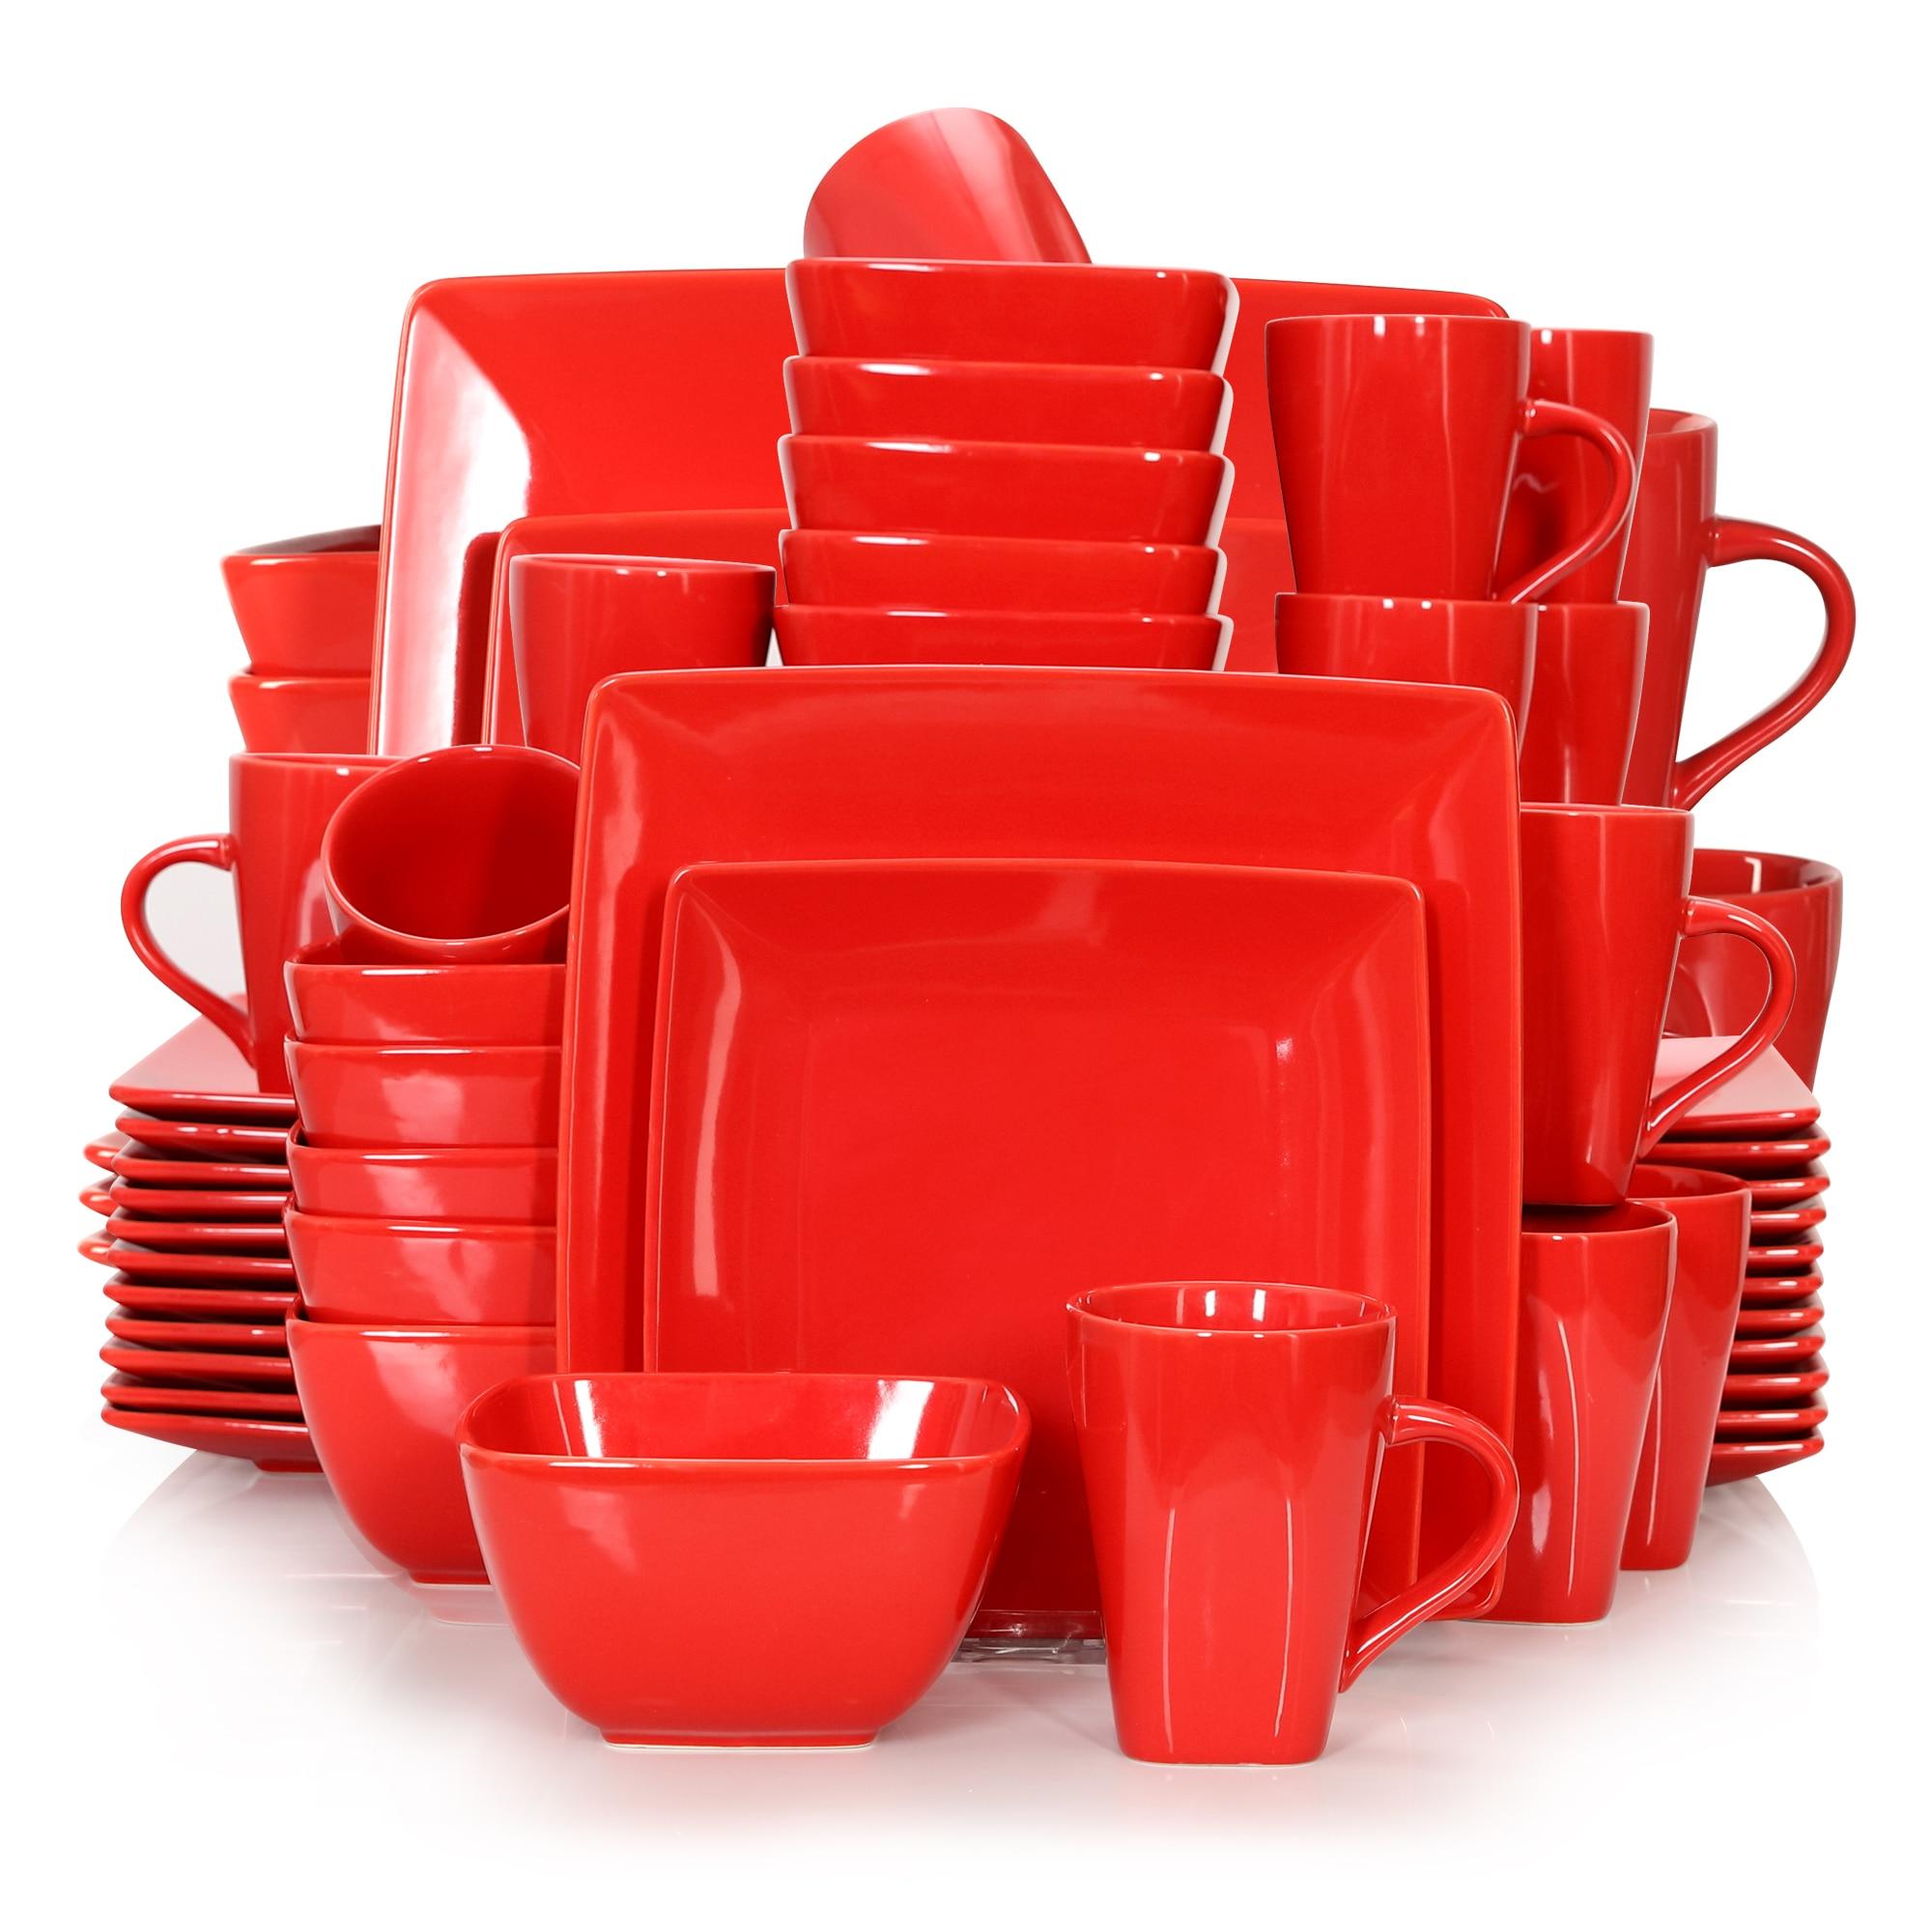 Vancasso SOHO 16/32/48-Piece Red Ceramic Porcelain Square Dinnerware Set with Dinner Plate,Dessert Plate,Bowl,240ml Mug Set